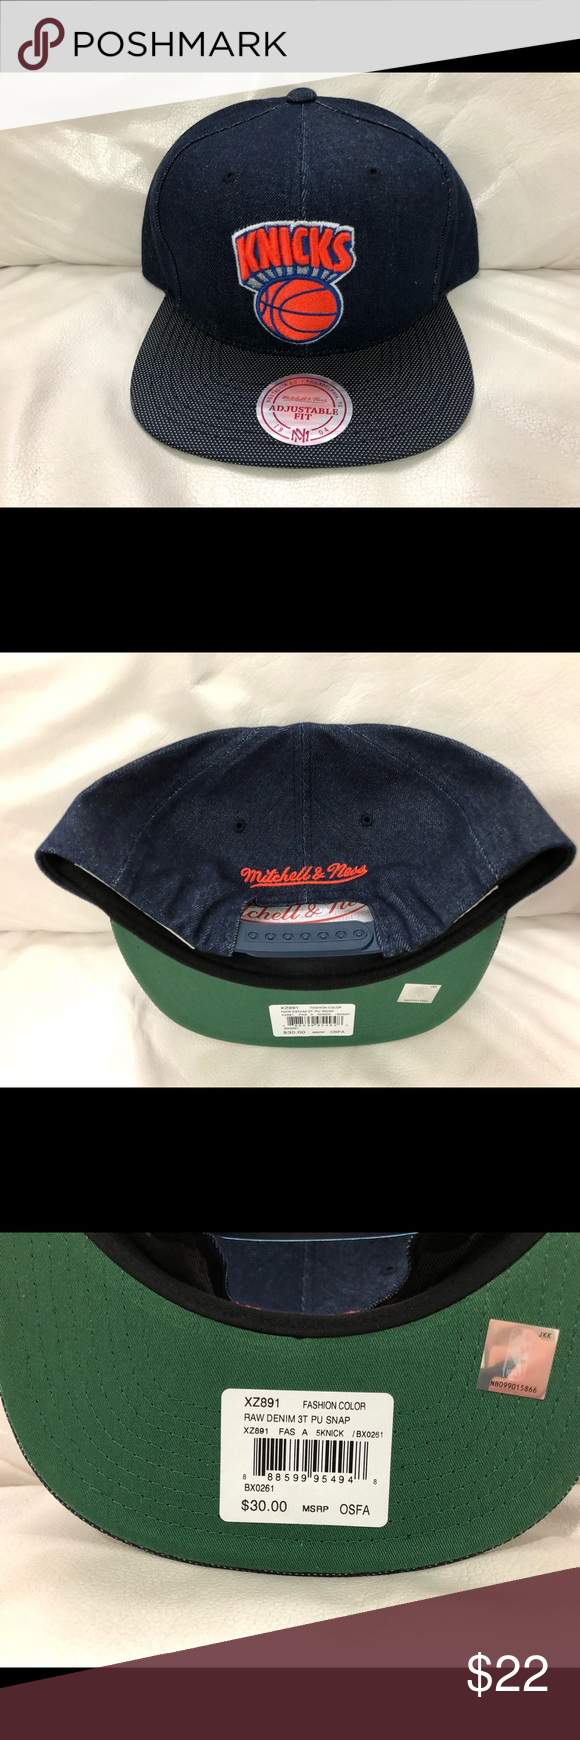 51c97931707e4 Mitchell   Ness New York Knicks Snapback Hat New Mitchell   Ness New York  Knicks Hat Cap Snapback Denim One Size Fits All NBA New w  Stickers  Attached ...